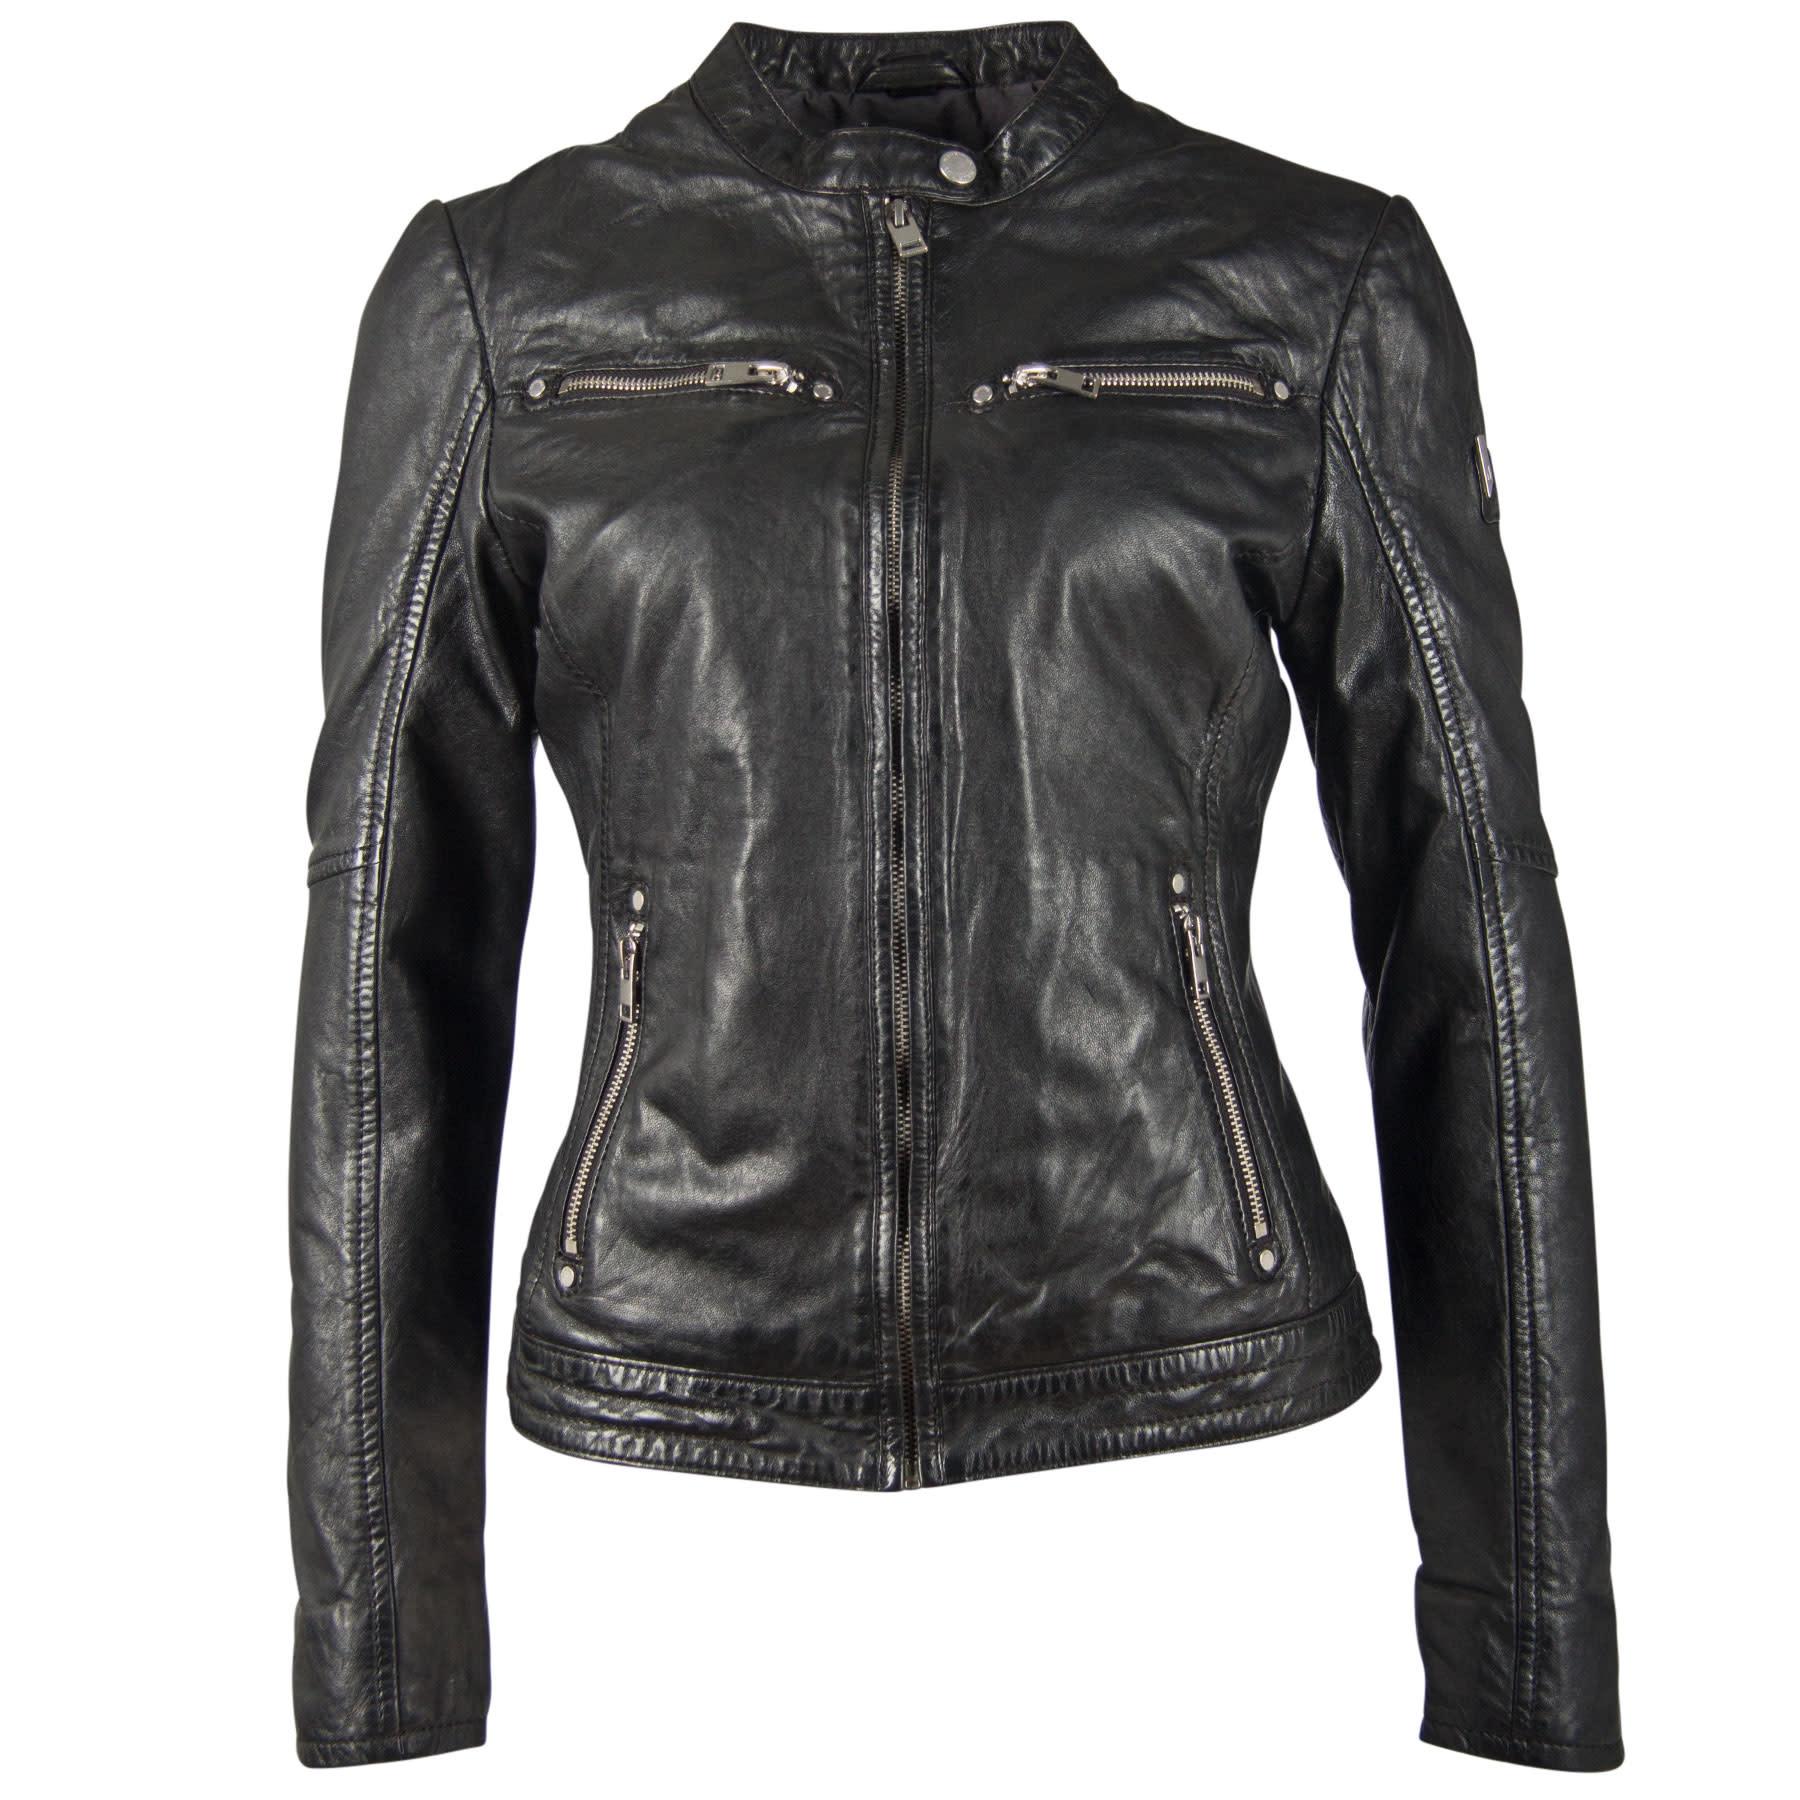 Charlee Leather Jacket